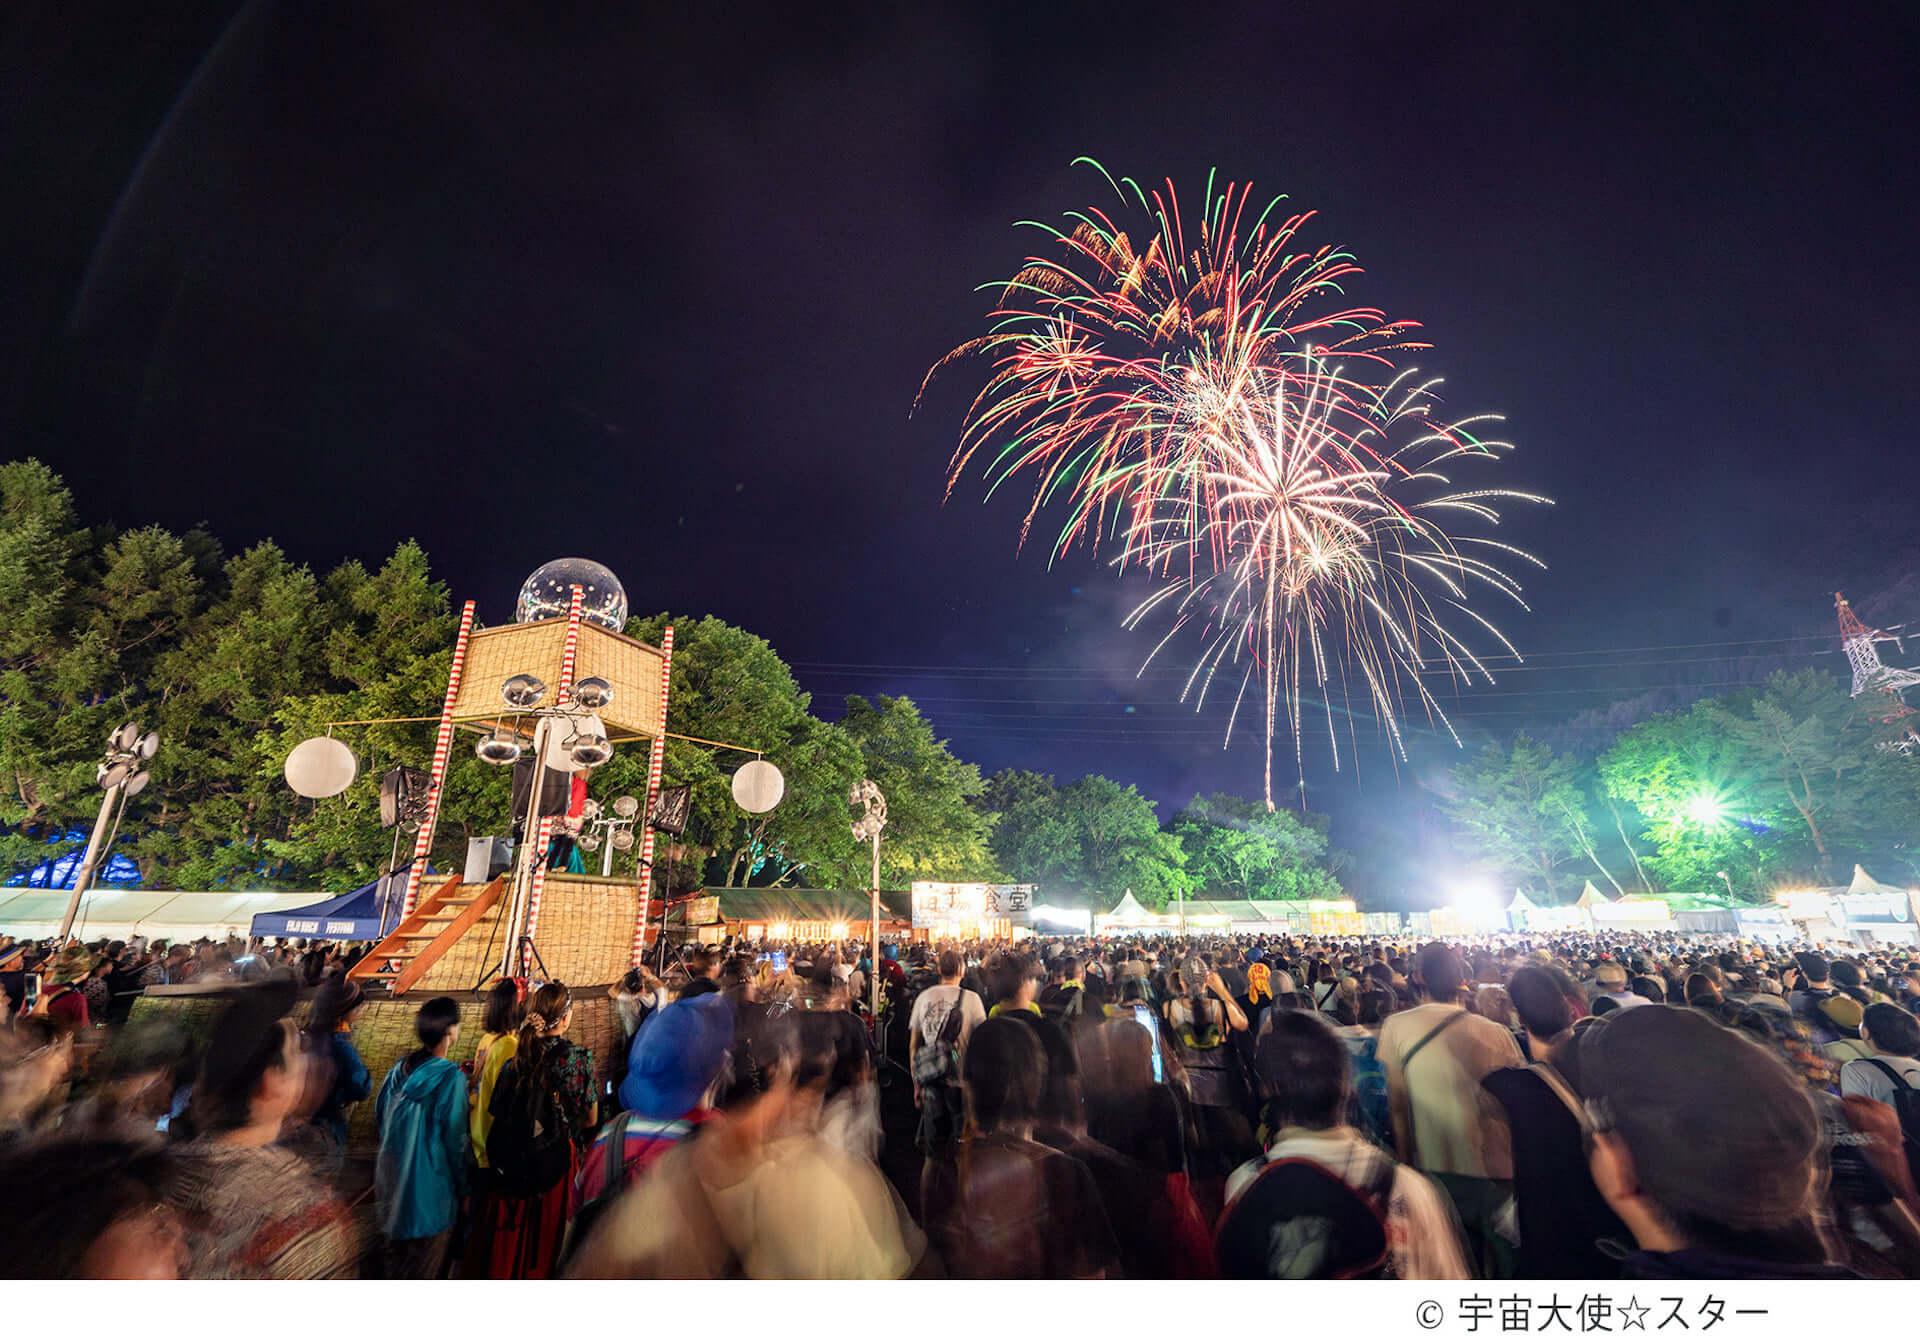 <FUJI ROCK FESTIVAL '20>の延期に伴い、未発表デザインのTシャツなど公式グッズが期間限定発売!チケット対応の詳細も発表 music200619_fujirockfestival_1-1920x1336